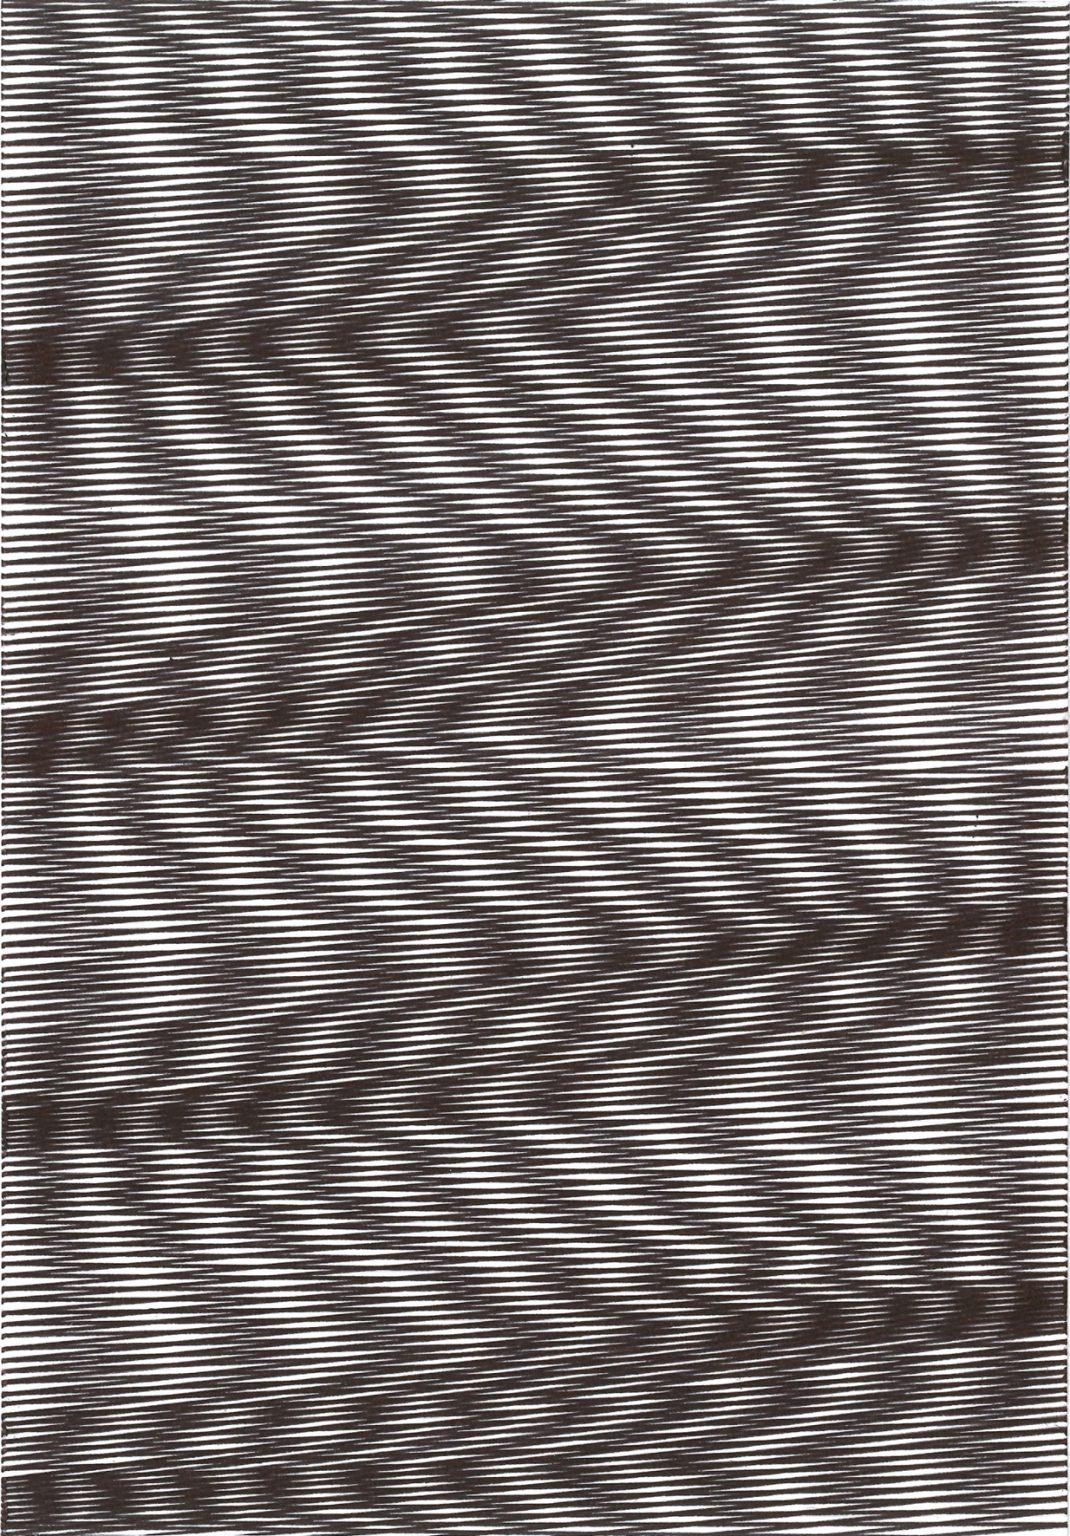 Caroline Kryzecki,KSZ 21/15–04,Kugelschreiber auf Papier, 21 x 15 cm, 2016